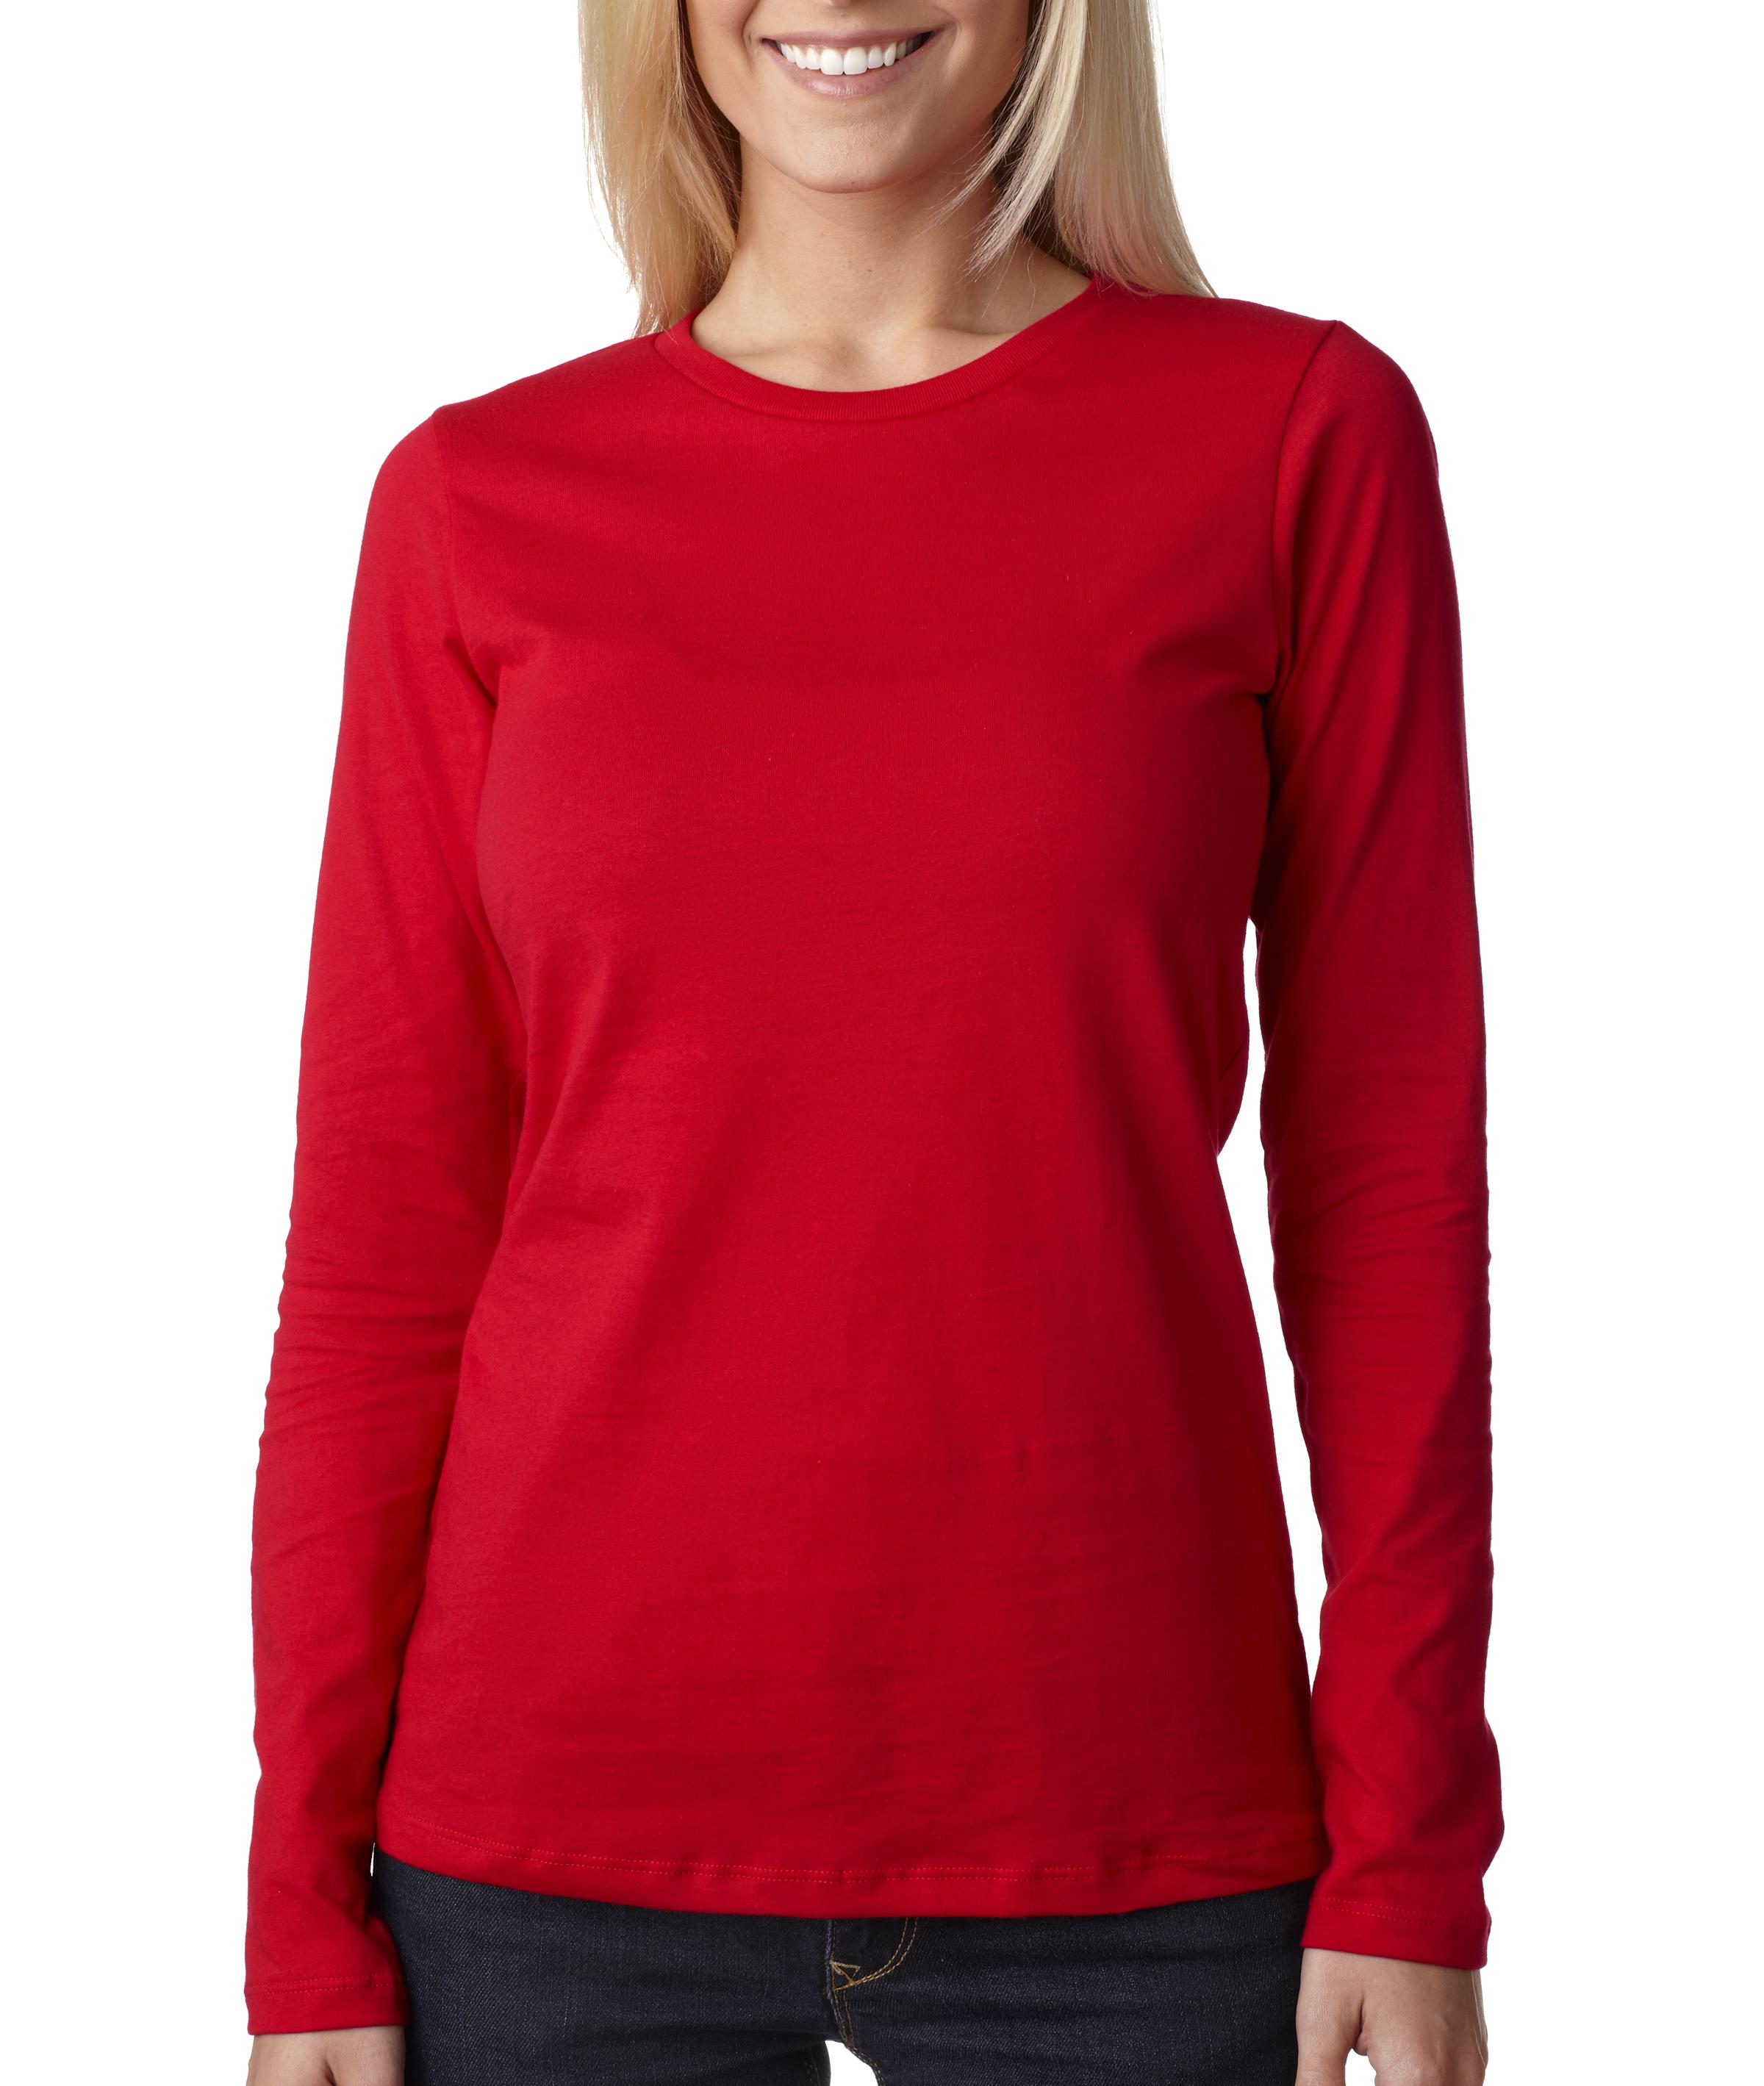 Bella+Canvas Long Sleeve Ladies' T-Shirt